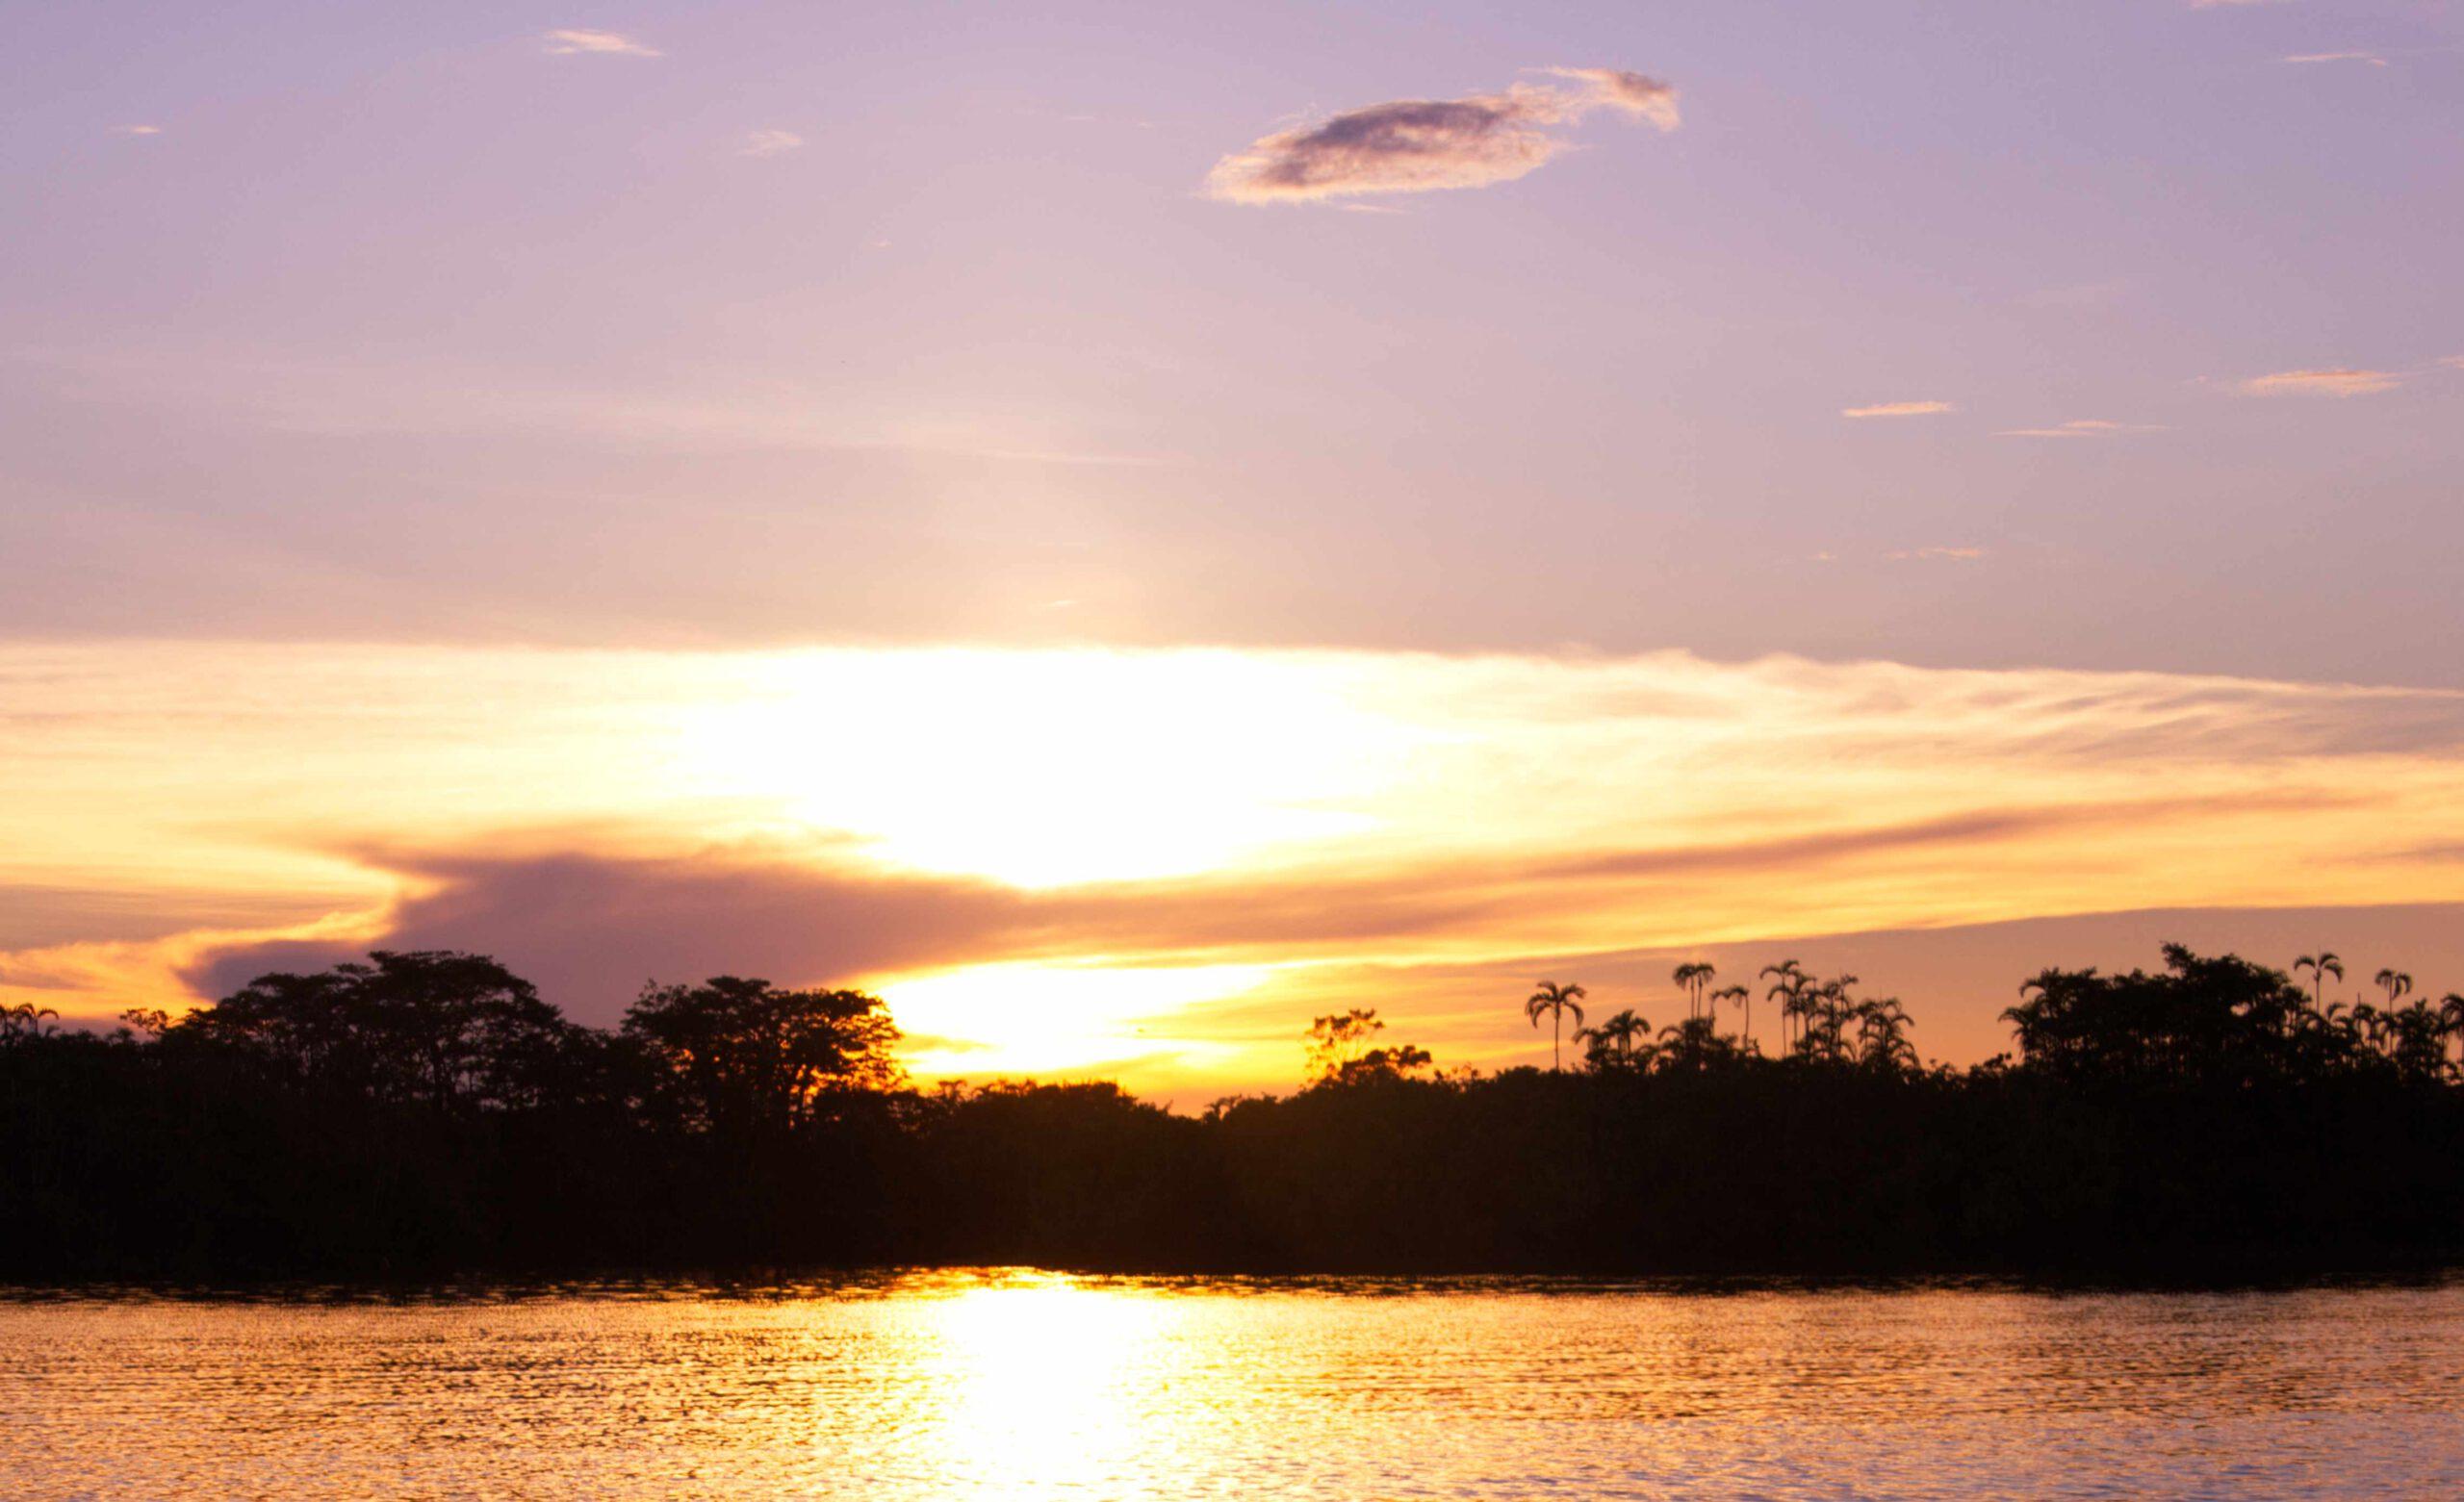 Sonnenuntergang über der Lagune, Cuyabeno Ecuador